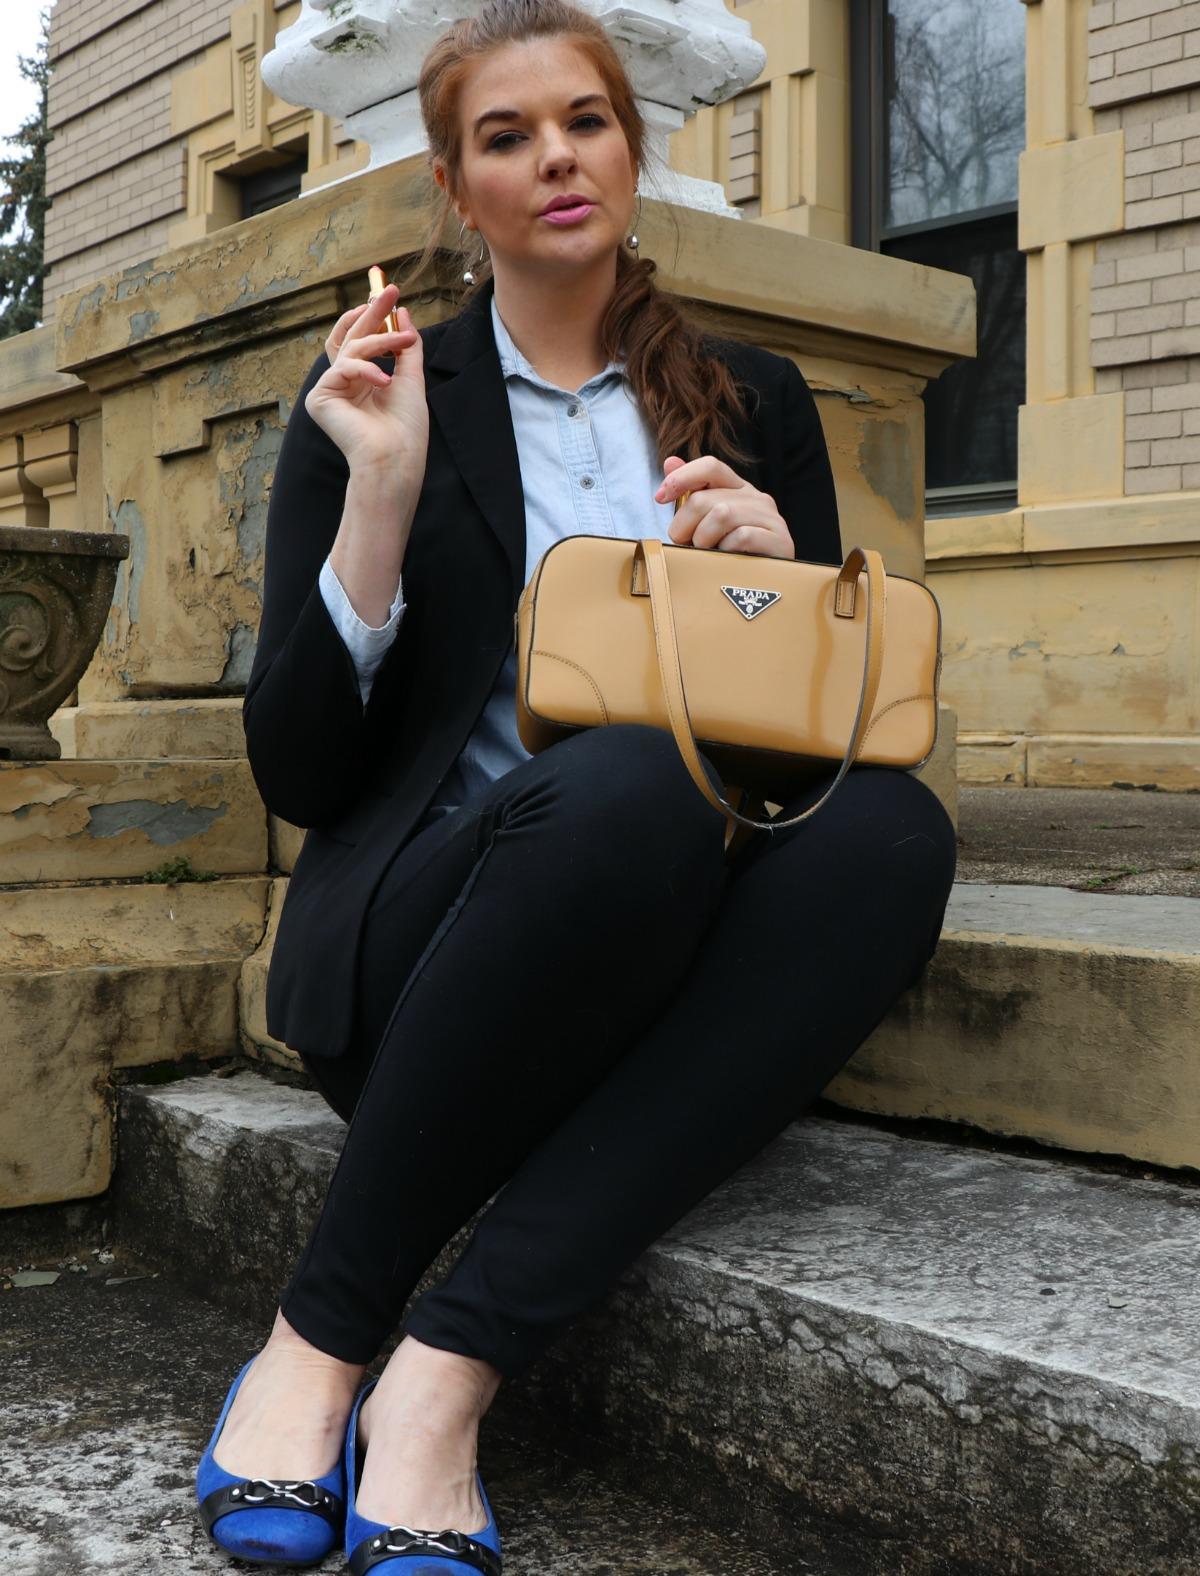 Spring Goals - Black Blazer with Denim Blouse and skinny jeans